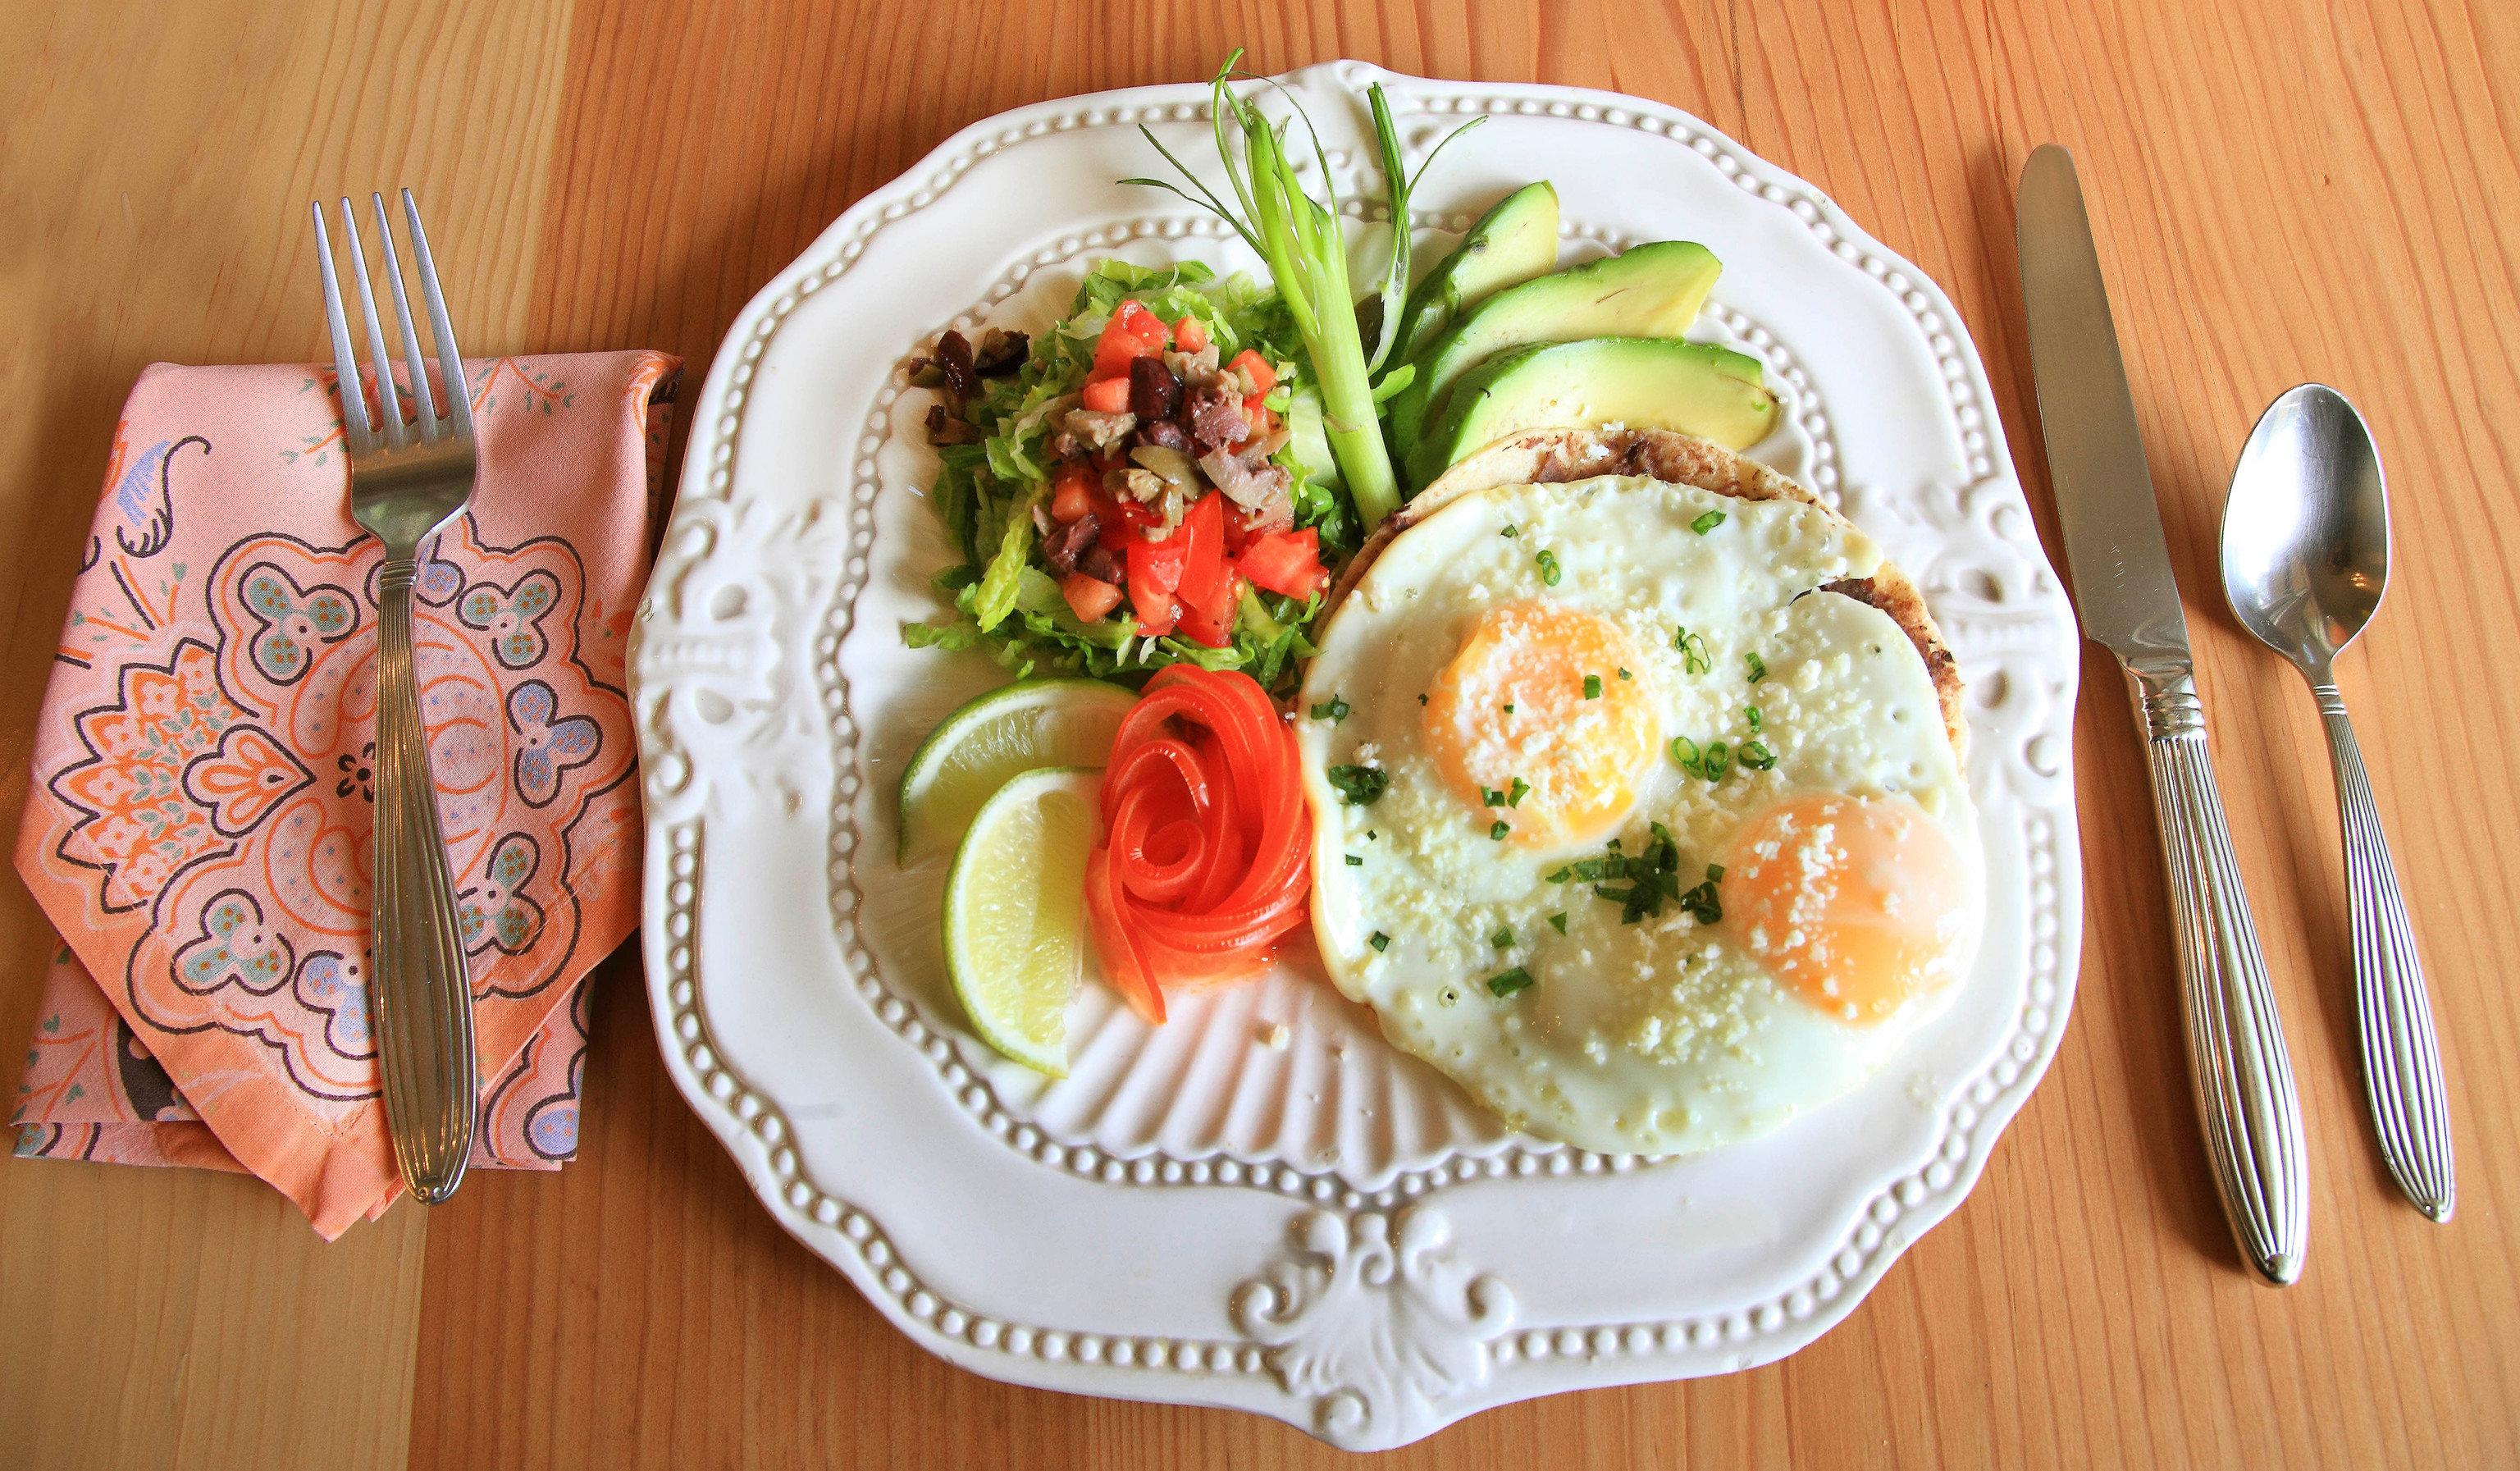 food plate wooden cuisine breakfast hors d oeuvre lunch vegetable